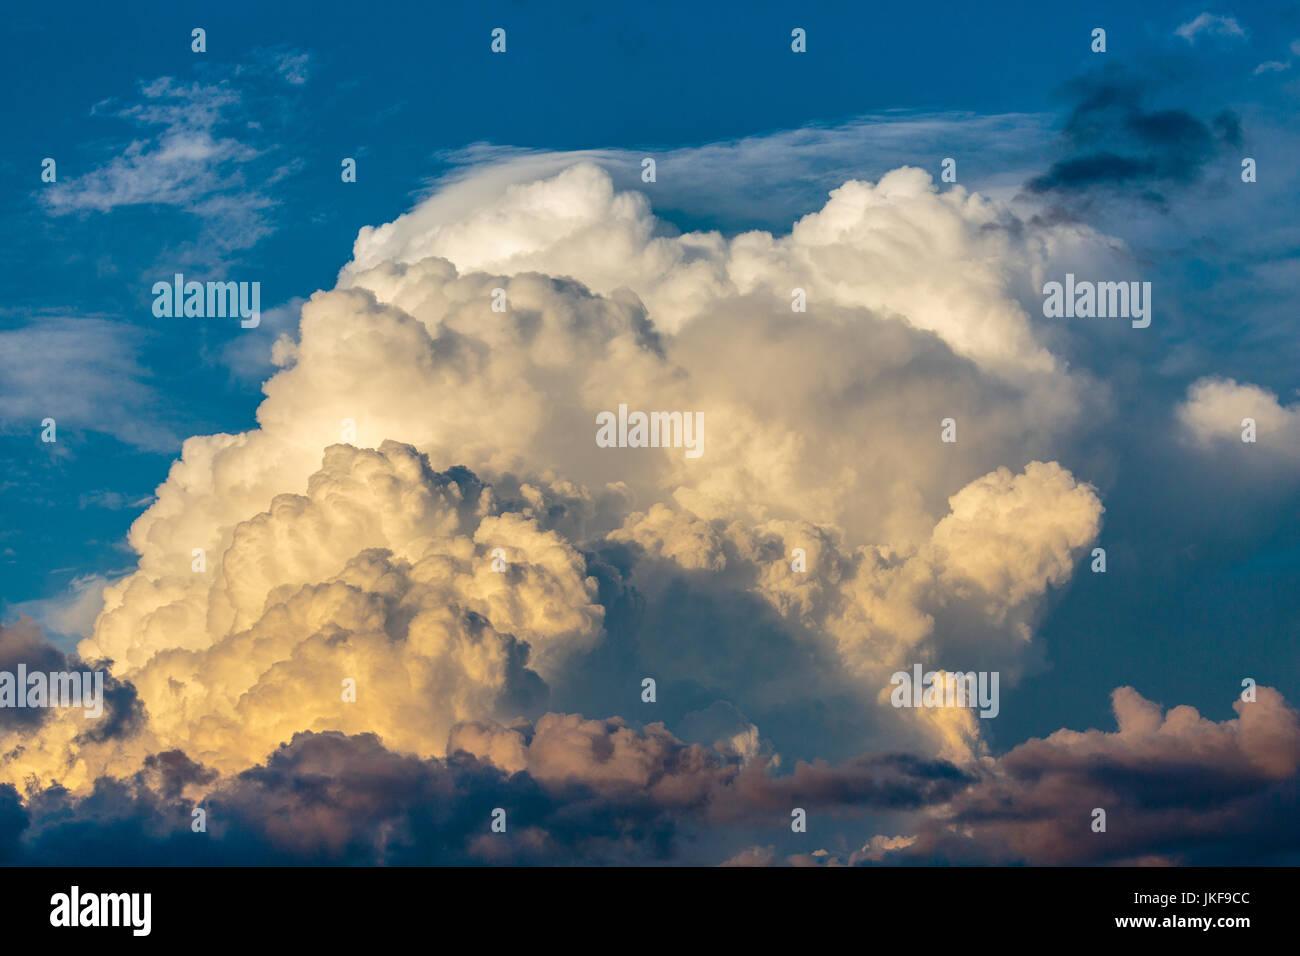 Cumulonimbus cloud against a Wisconsin blue sky in July - Stock Image